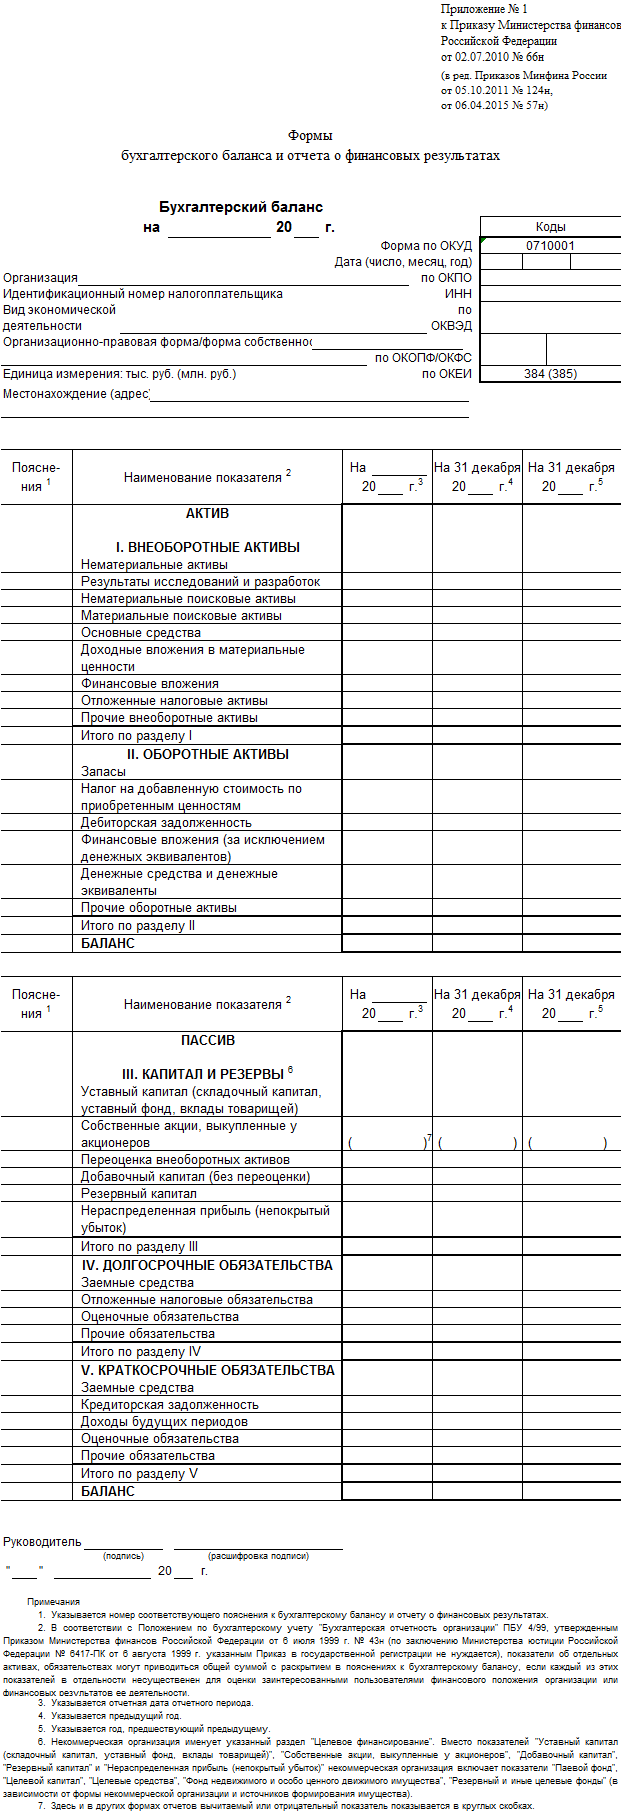 Бухгалтерский баланс (форма 1) бланк за 2016 год